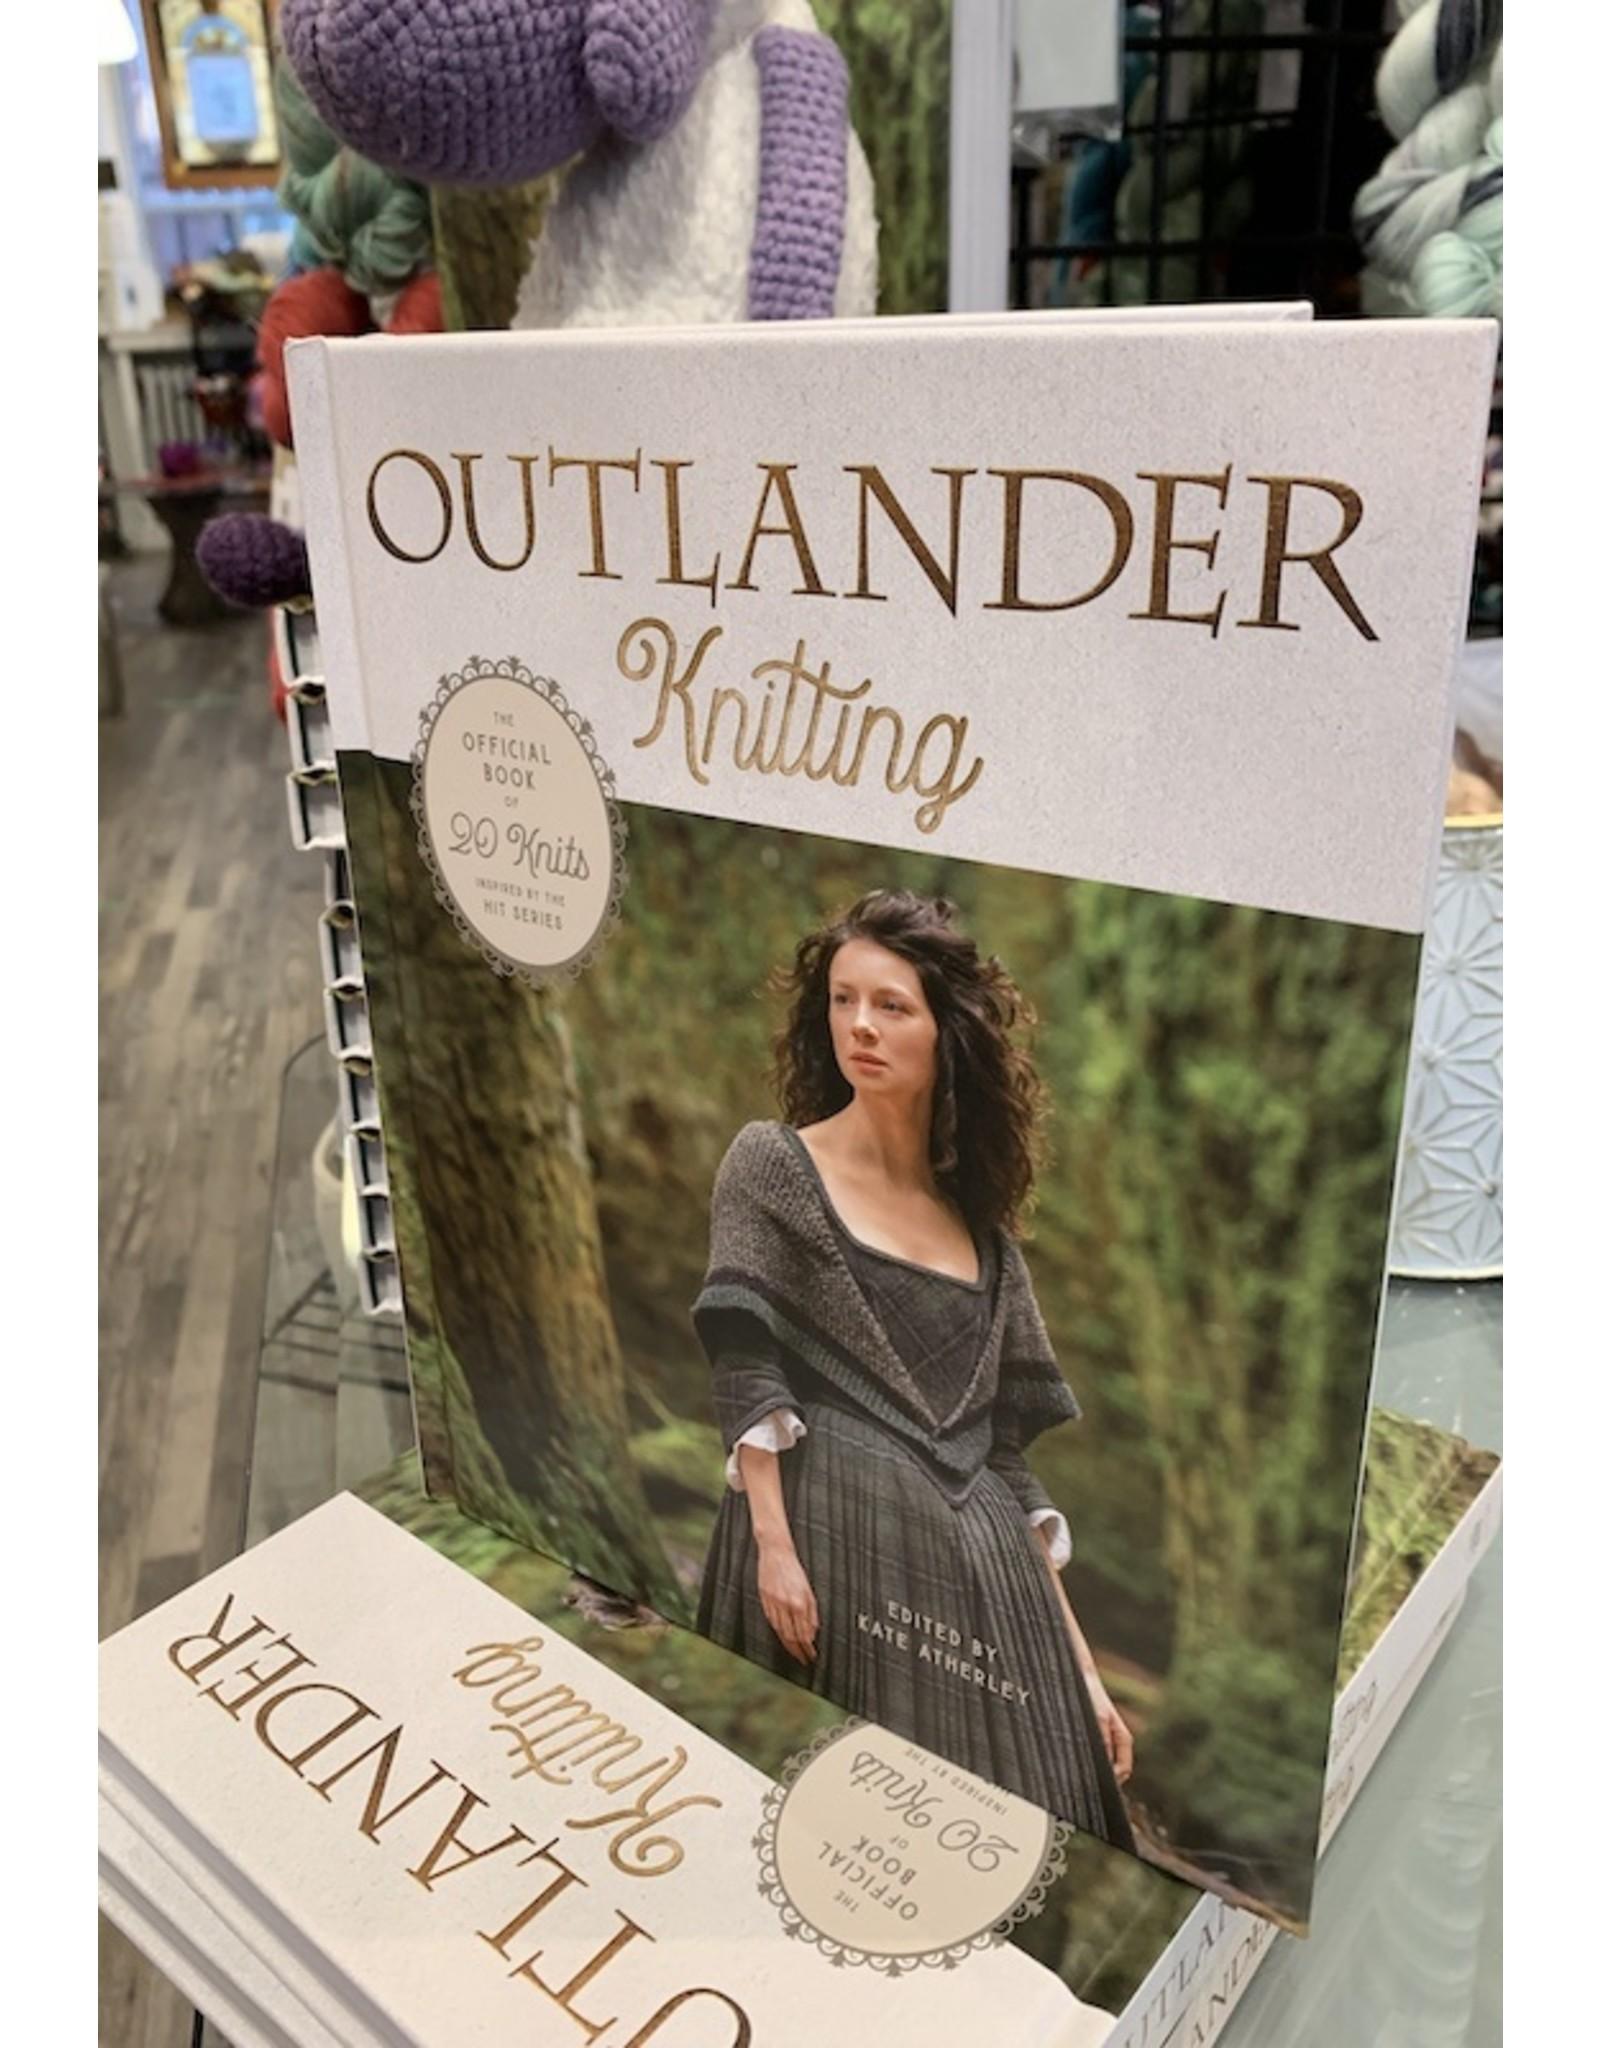 Outlander Knitting - Official Book